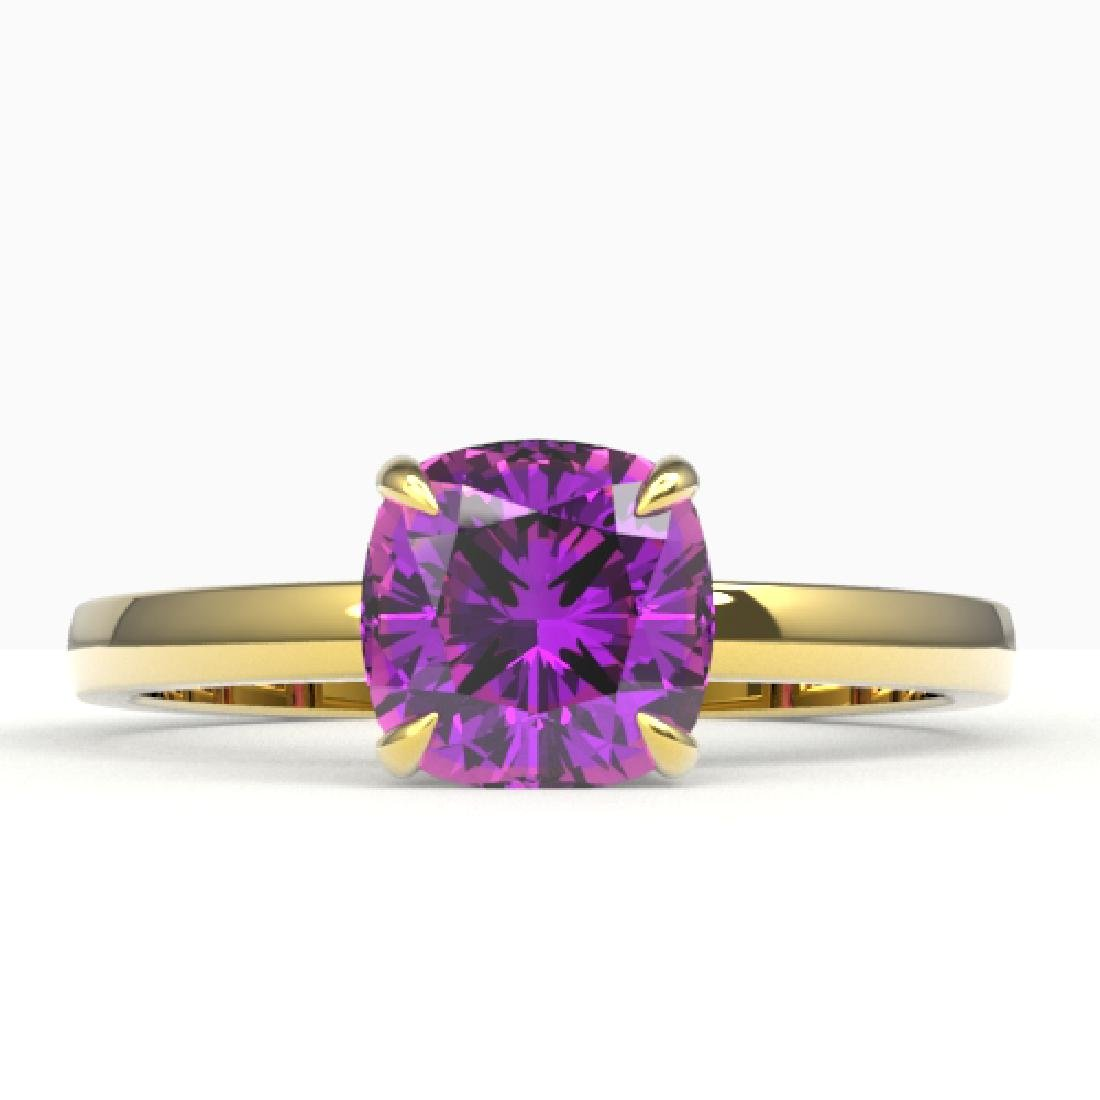 2 CTW Cushion Cut Amethyst Designer Engagement Ring 18K